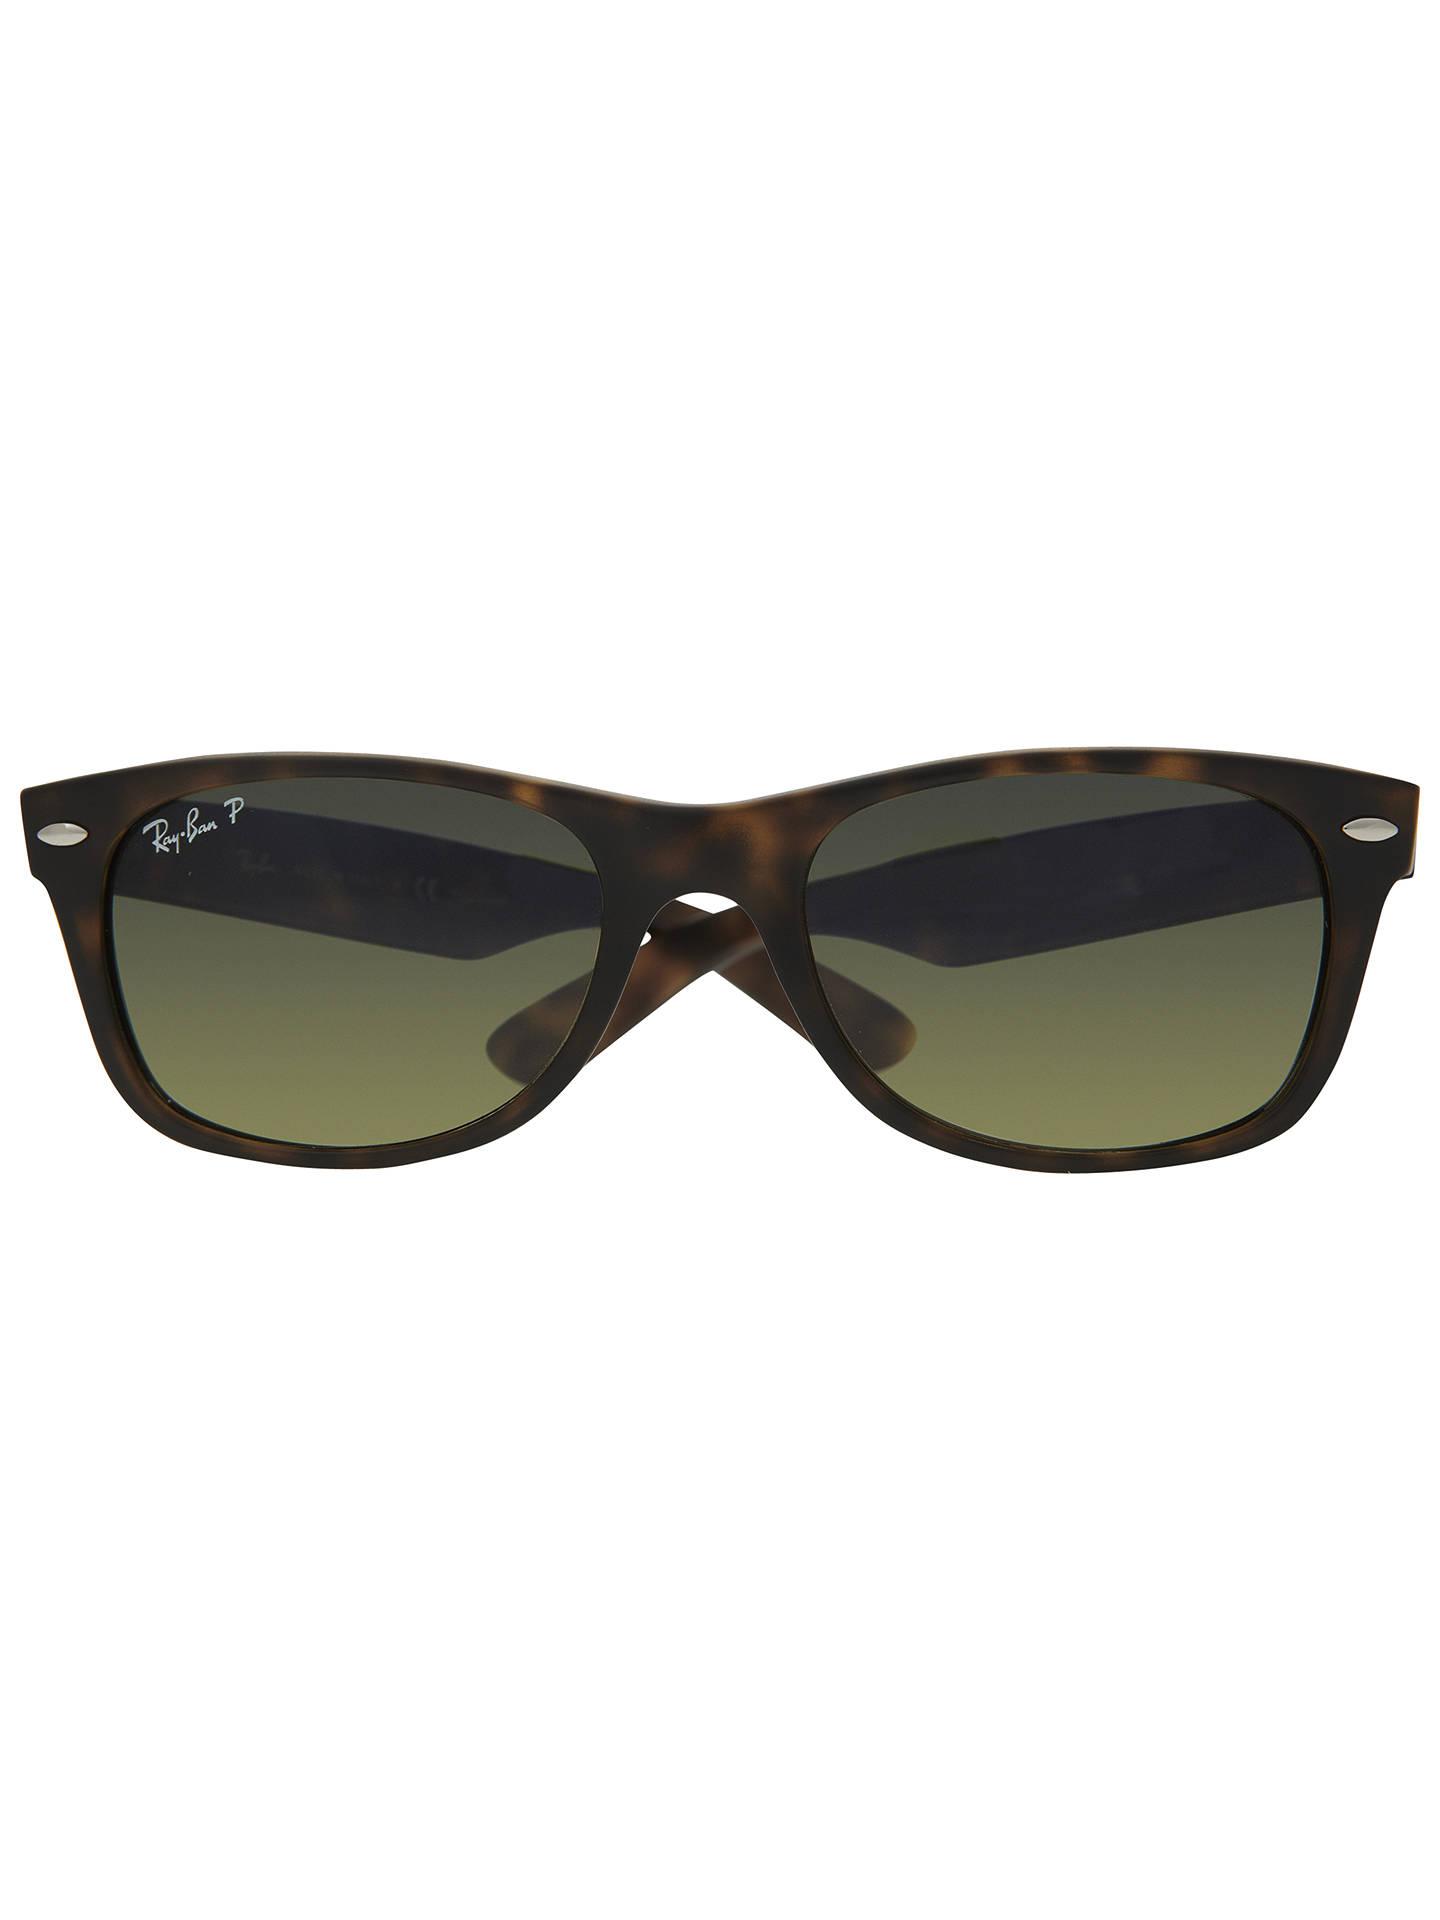 131bcb78b4 Ray-Ban RB2132 Men s New Wayfarer Polarised Sunglasses at John Lewis ...